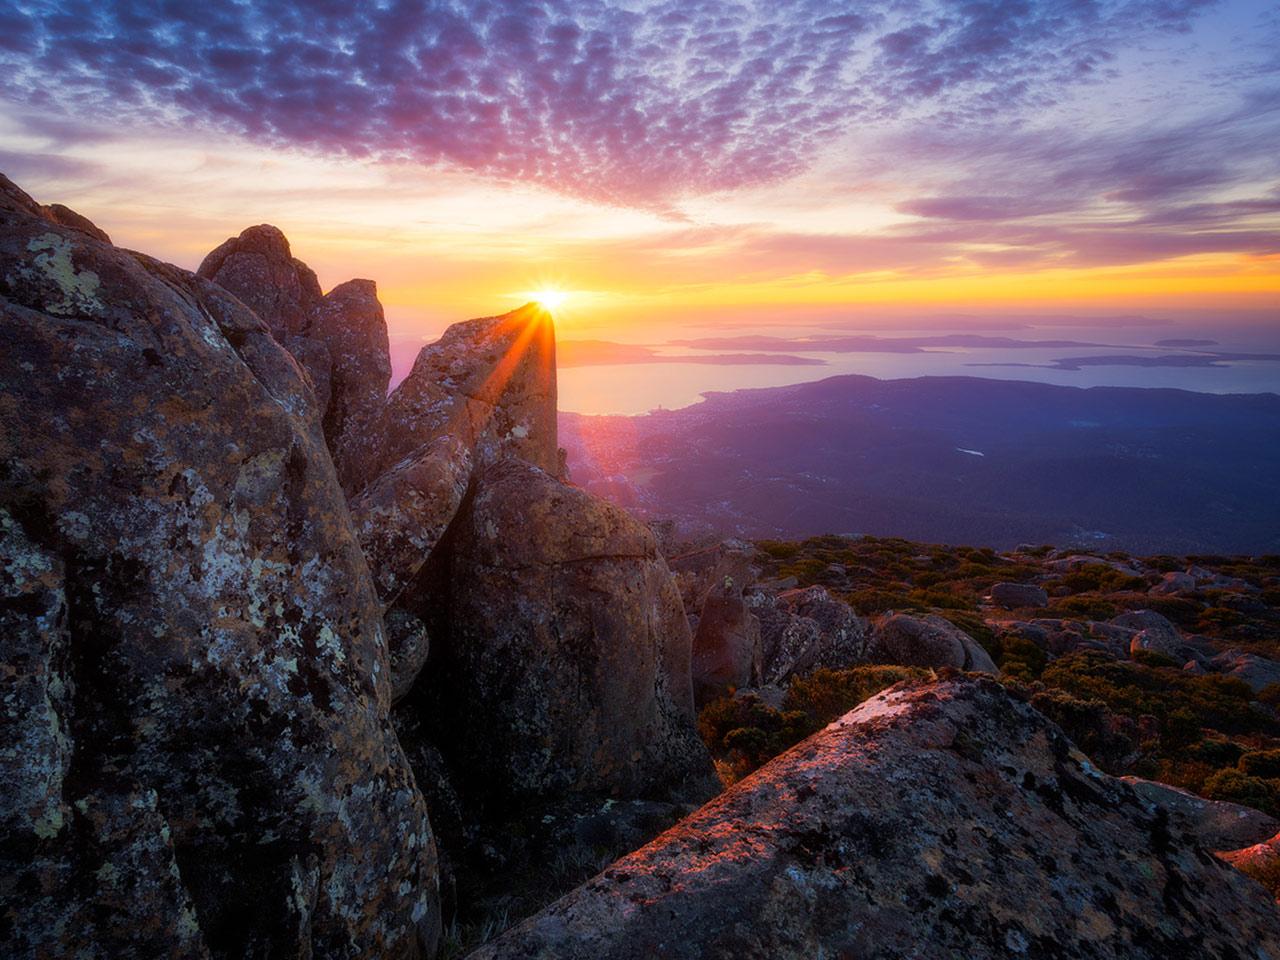 Landscape photographer Matt Donovan's Tasmania